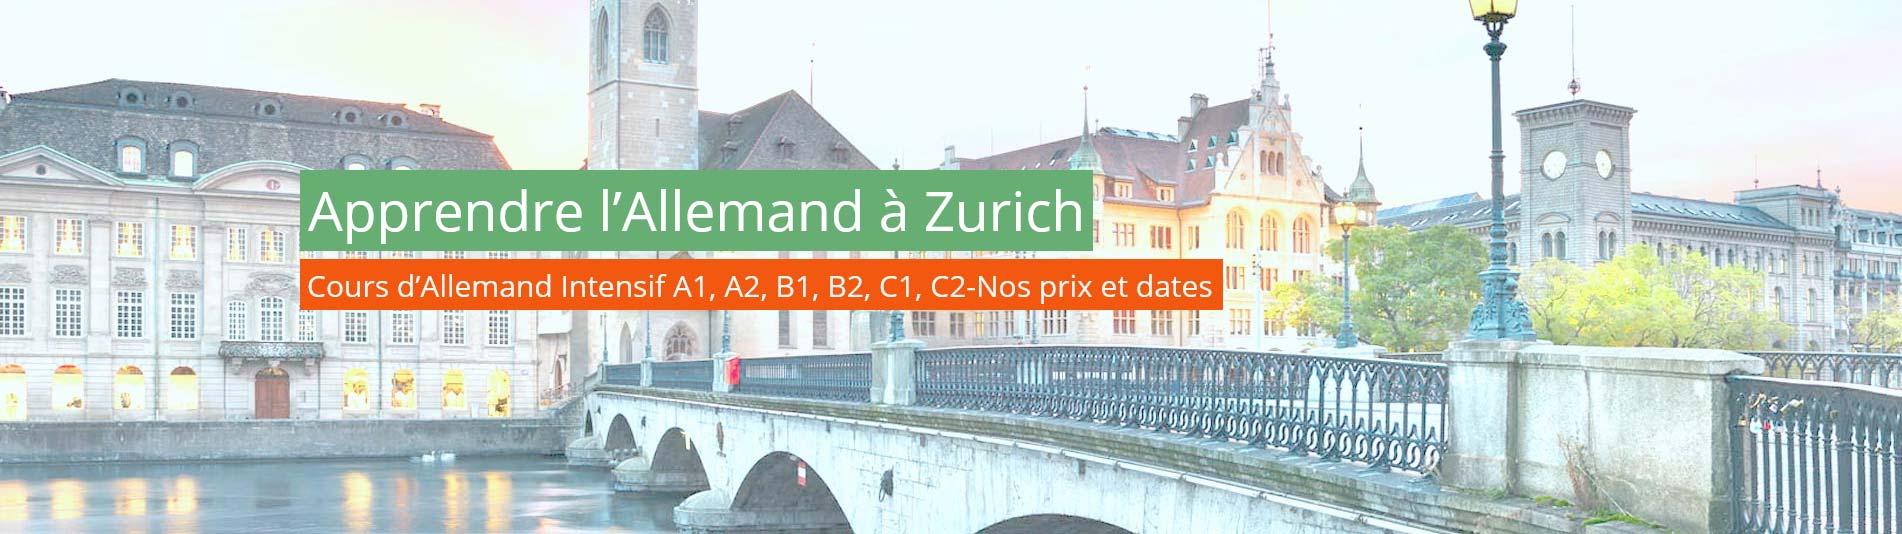 Apprendre l'allemand à Zurich